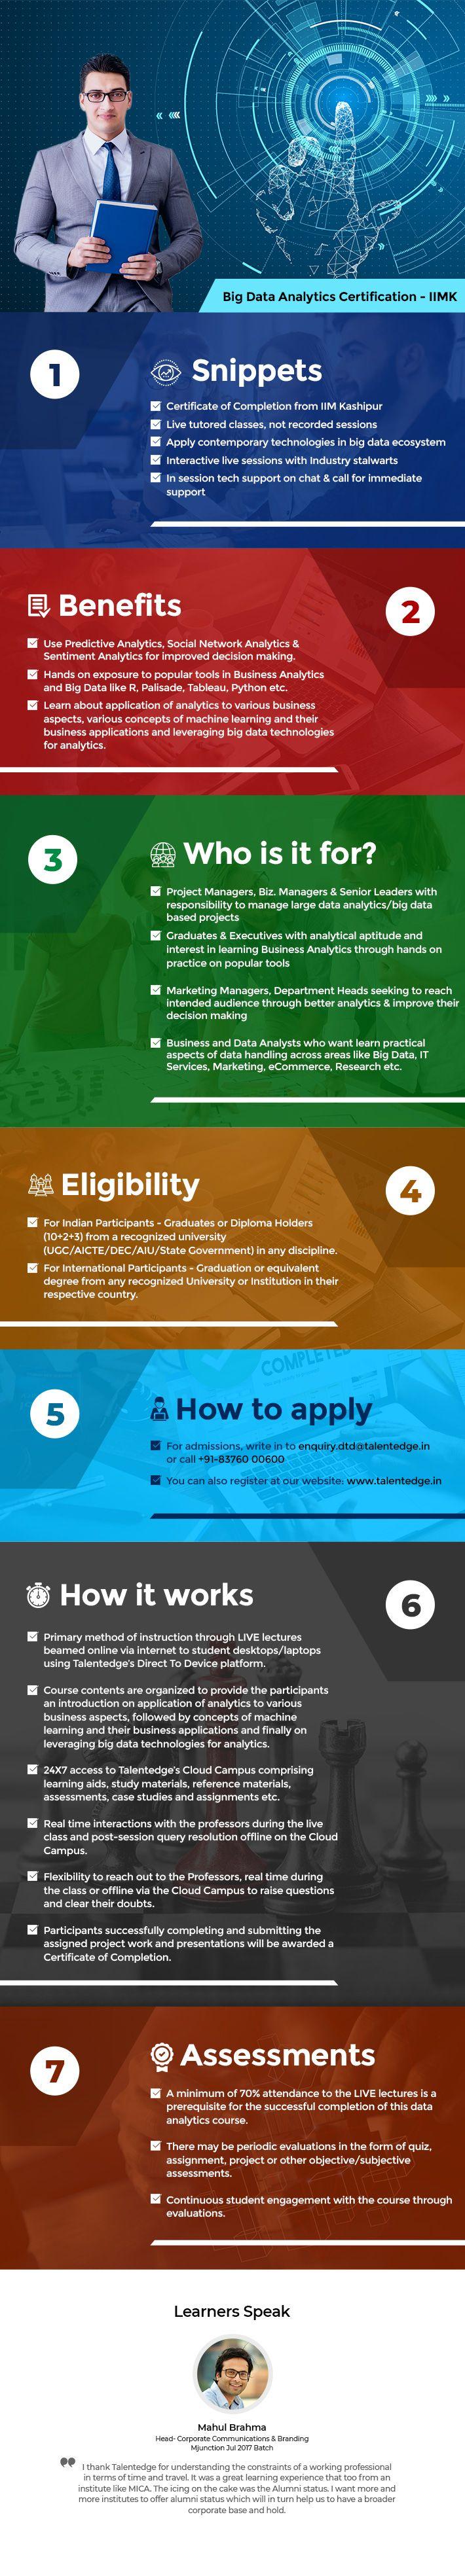 Big Data Analytics Course Certification From Iim Kashipur India